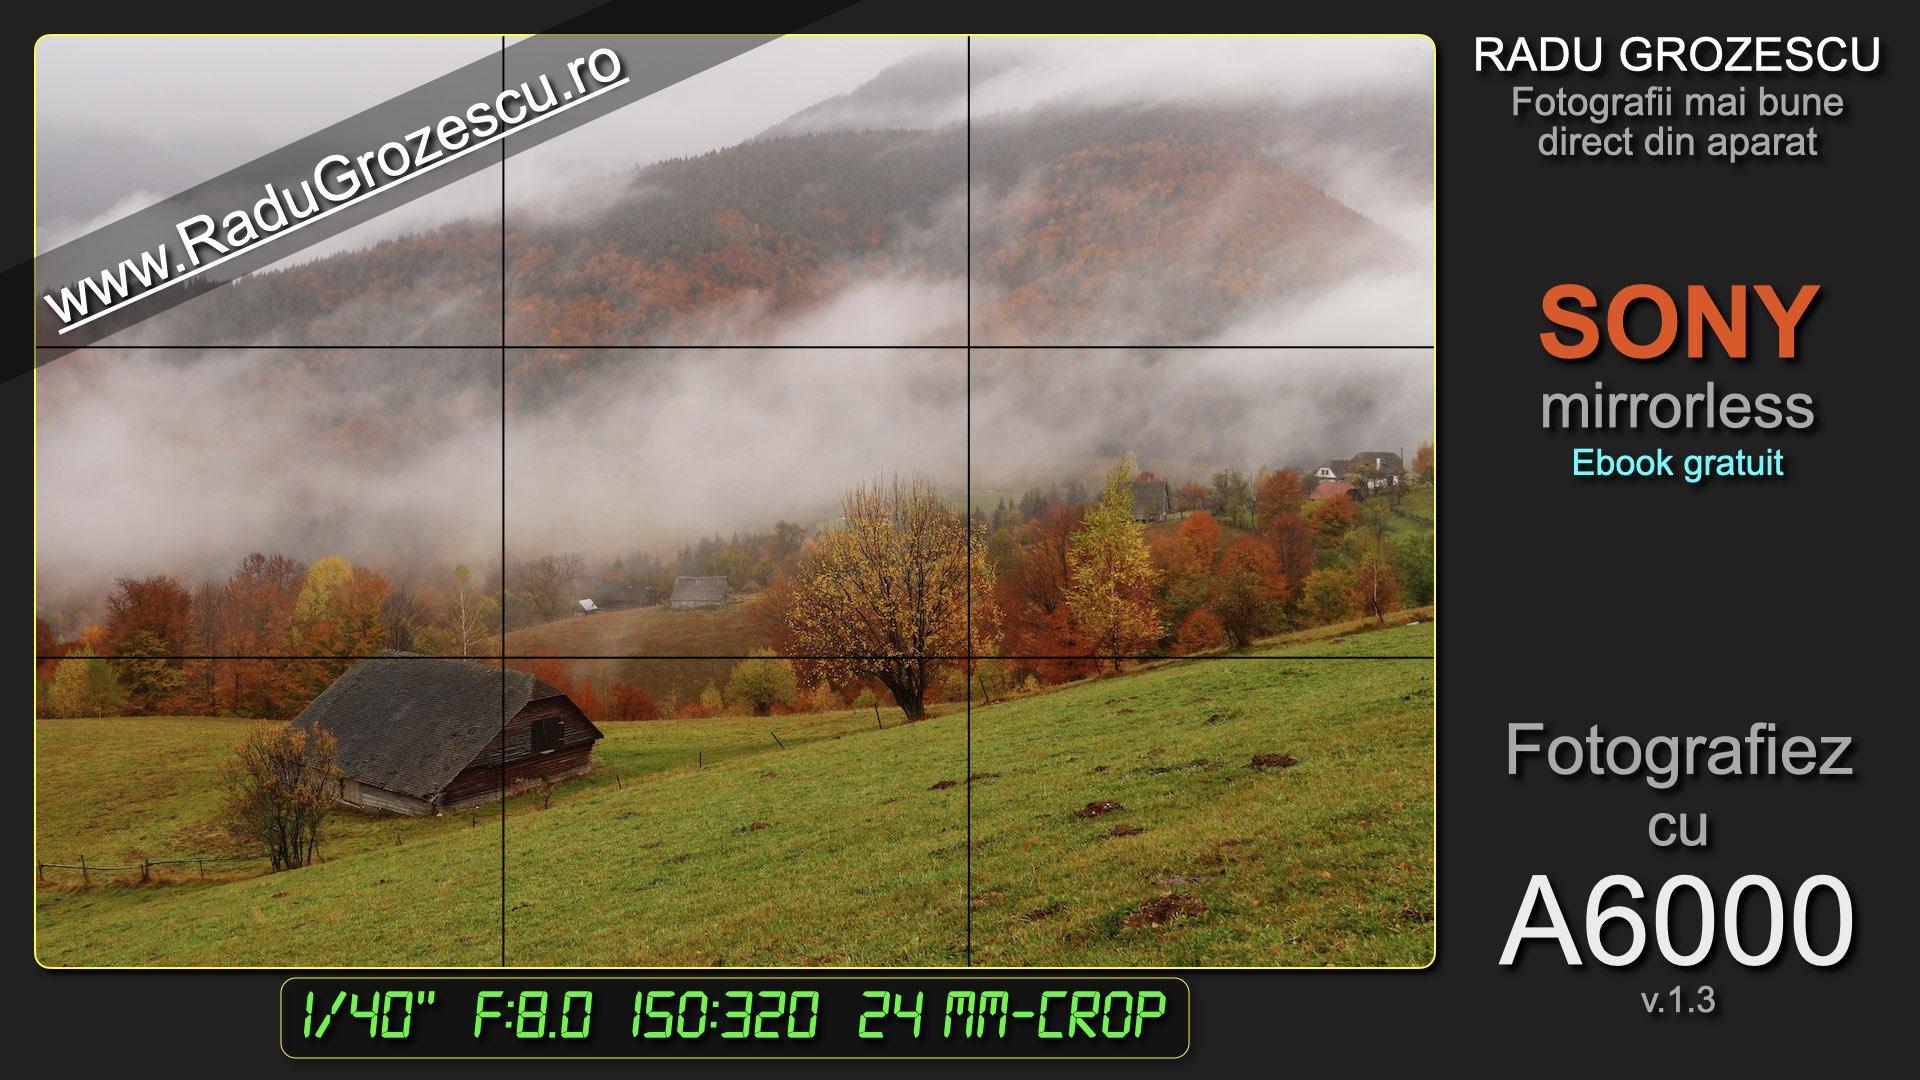 Fotografiez cu A6000 - Ebook foto varianta scurtă pentru Sony mirrorless